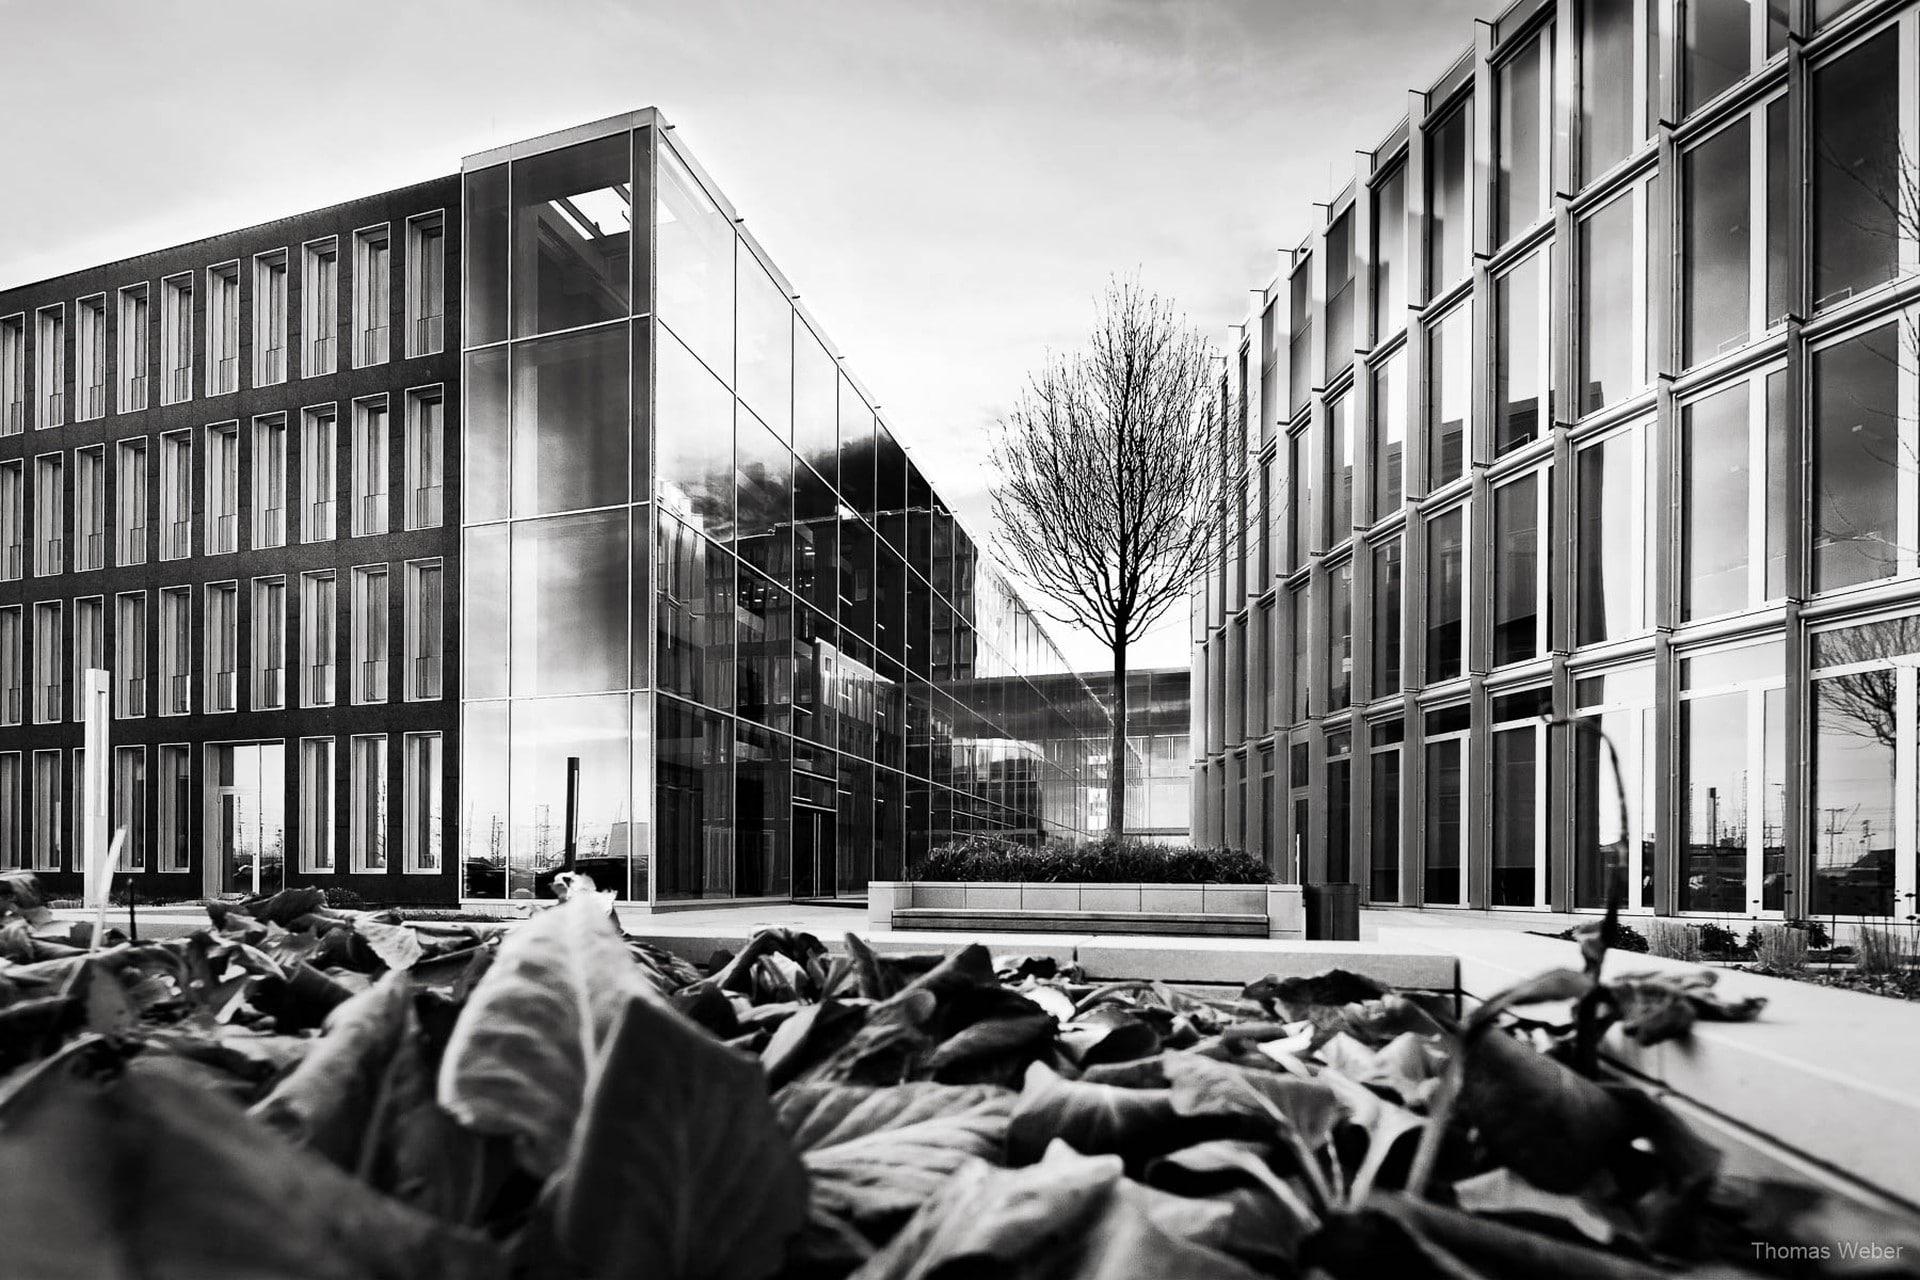 511-Thomas-Weber-Architekturfotos-2K68xSxk